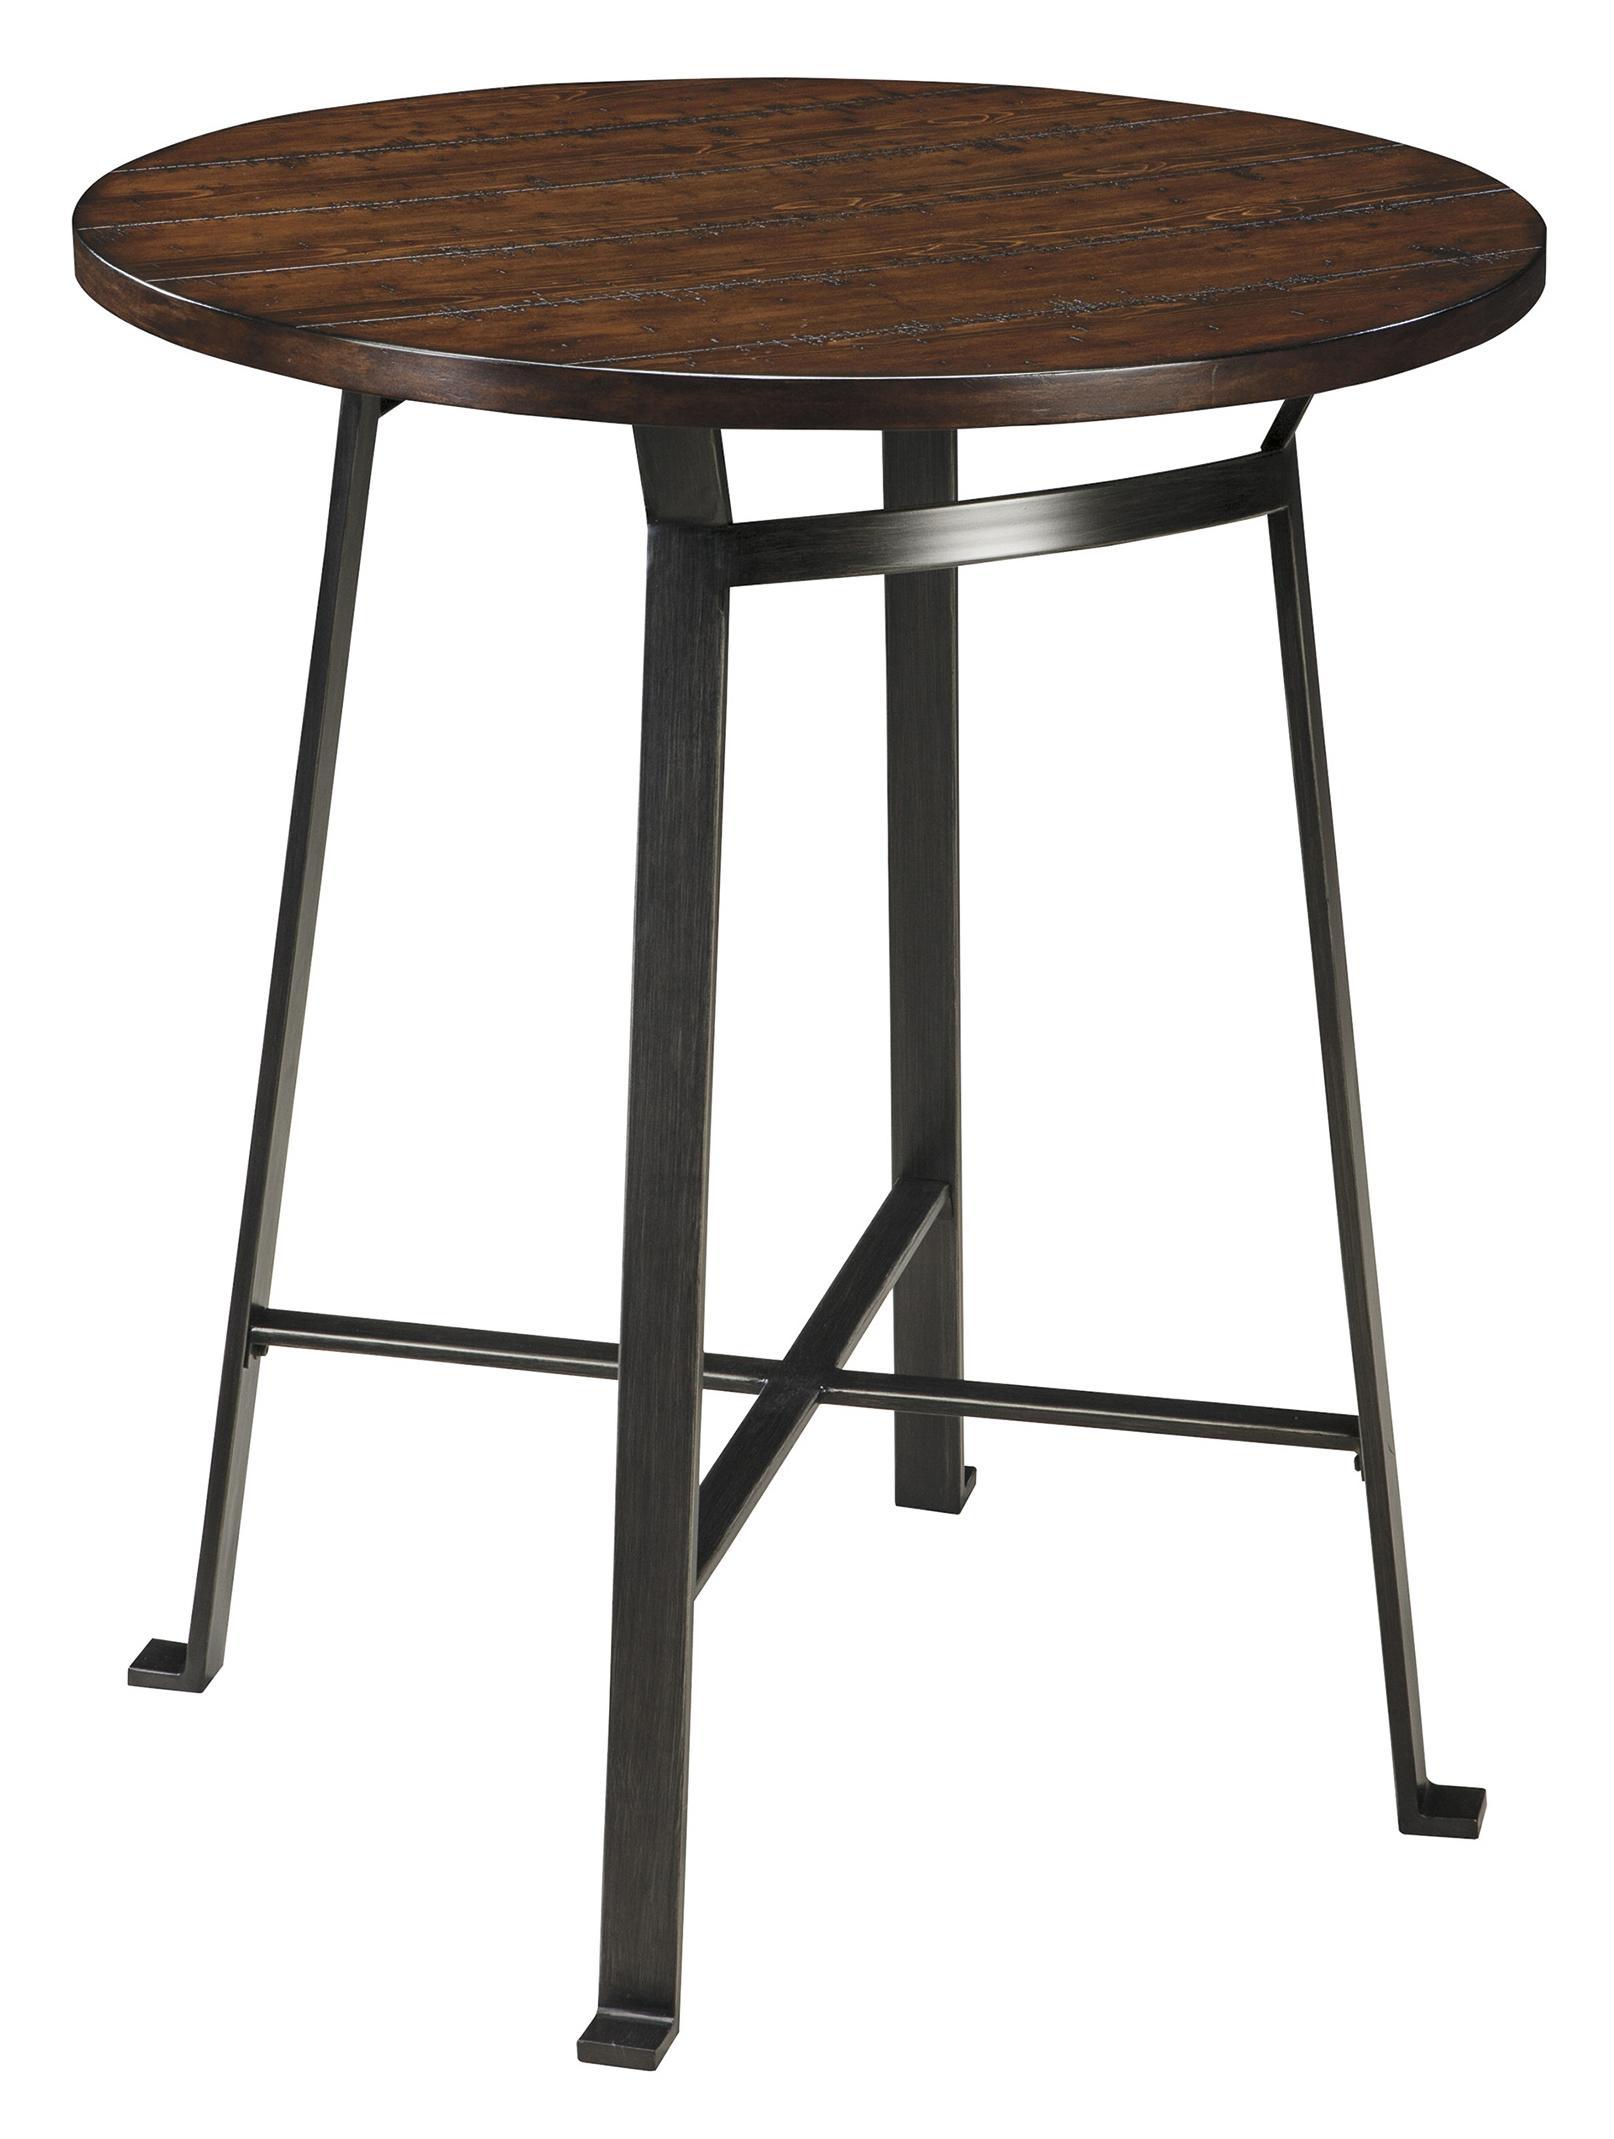 ... Signature Design By Ashley Challiman3 Piece Round Bar Table Set ...